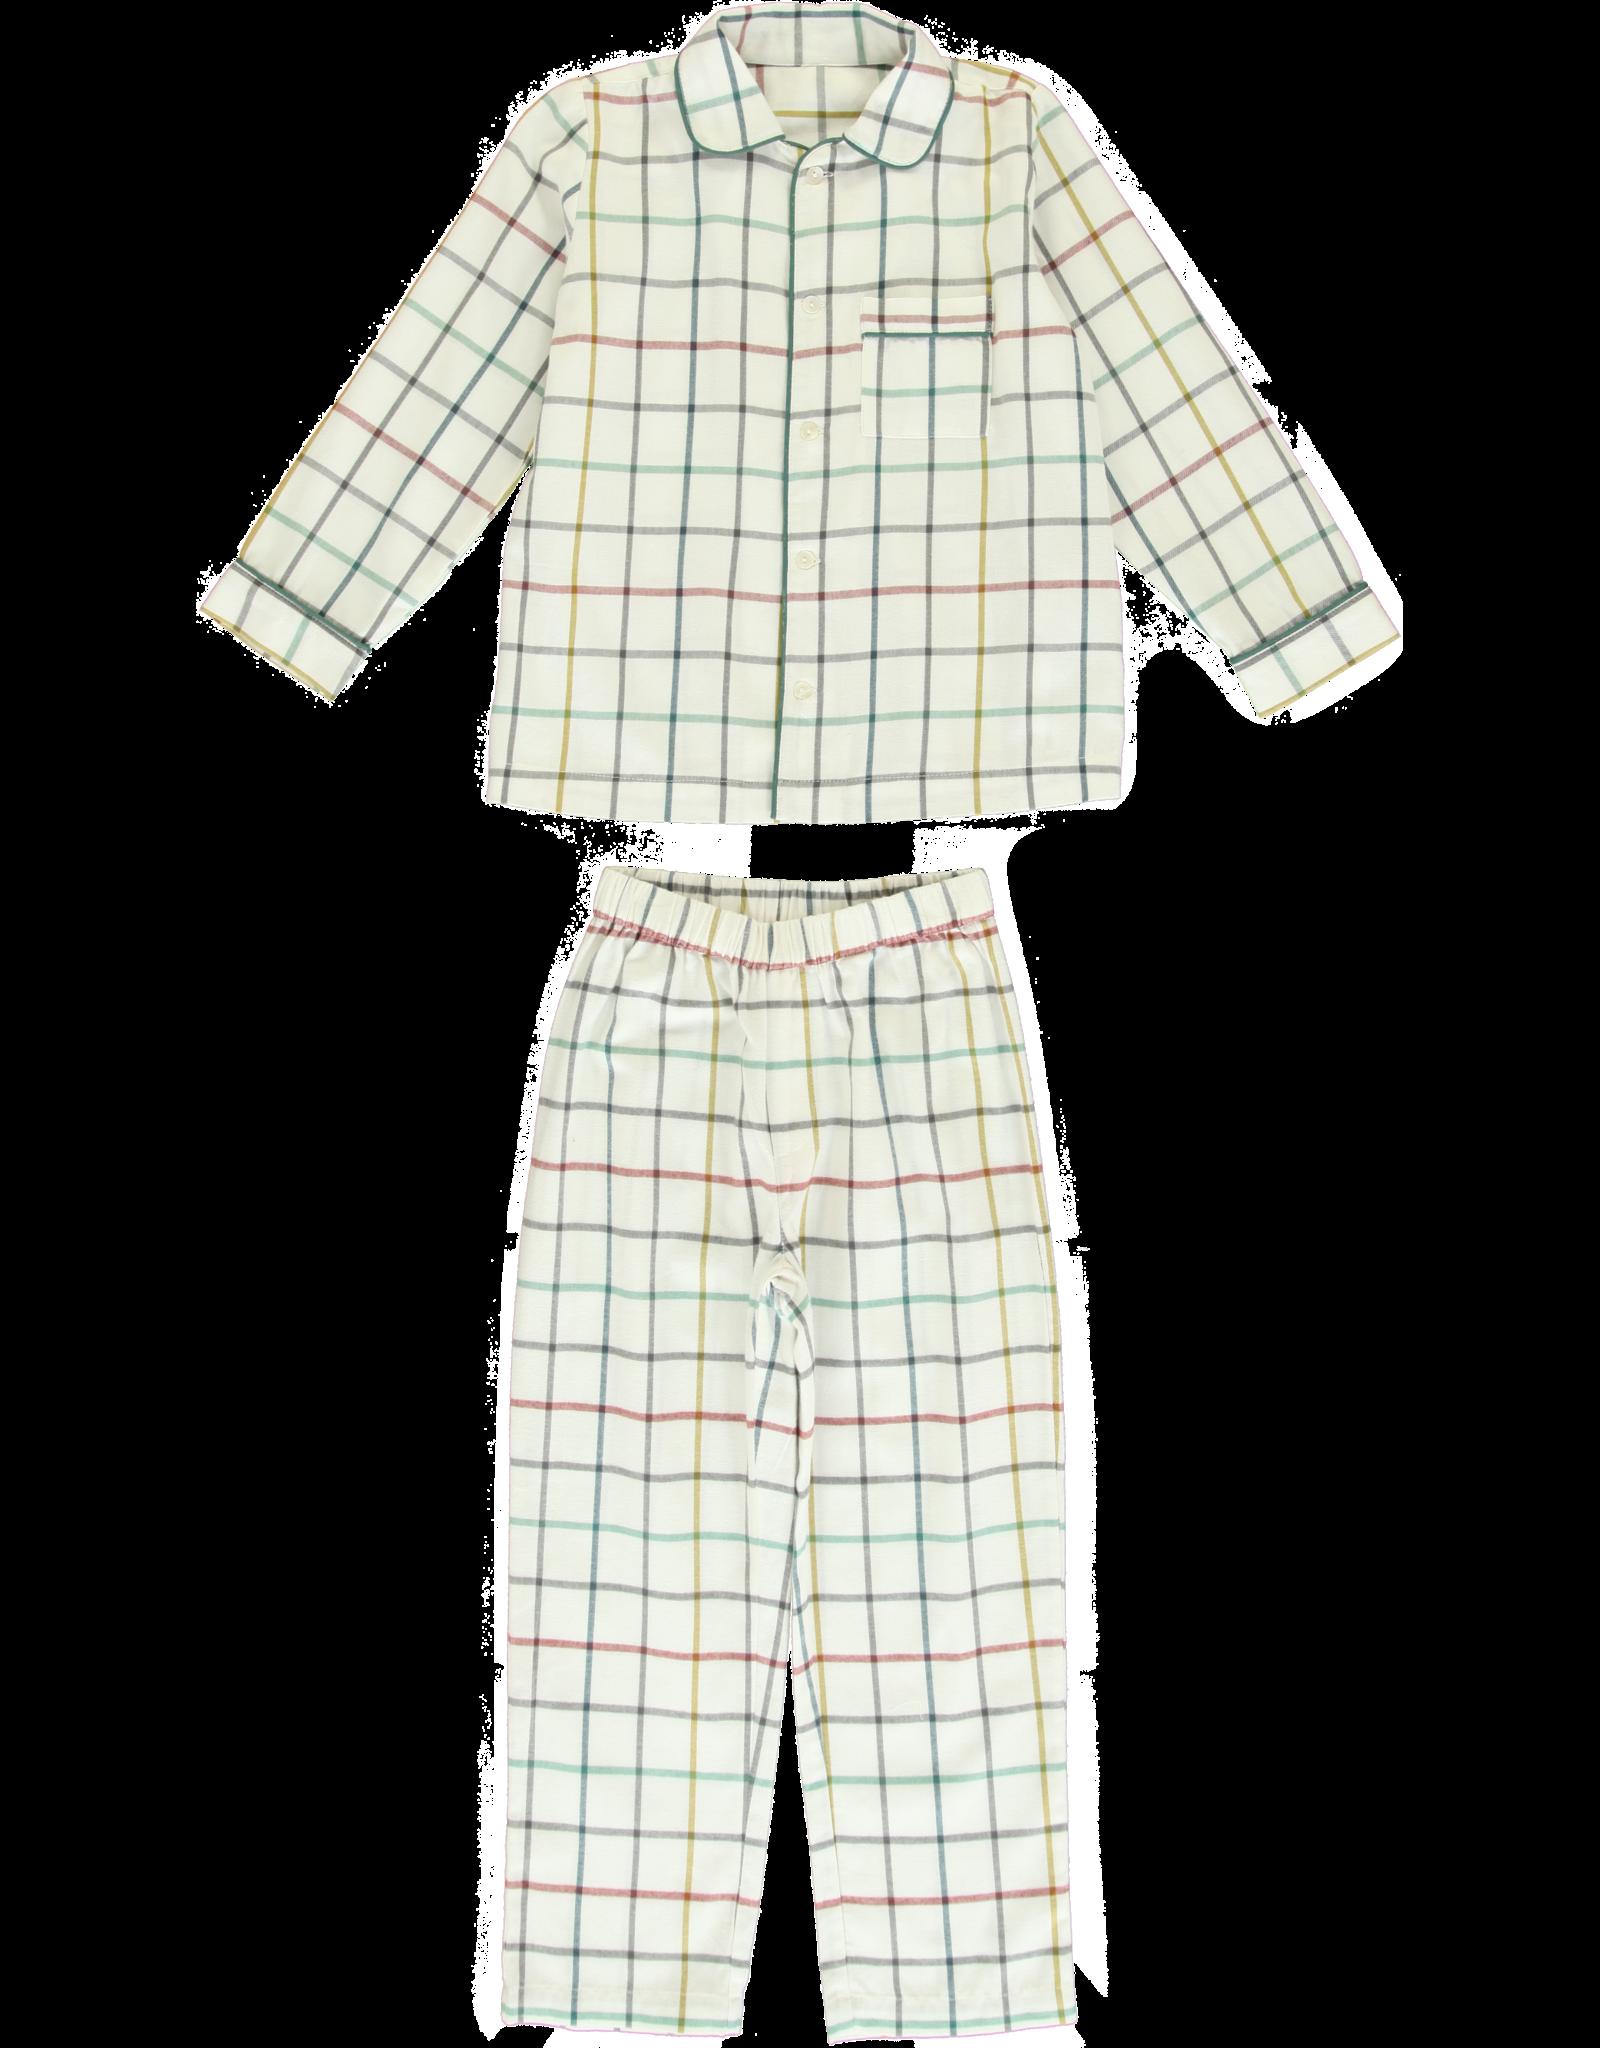 Dorélit Mercure + Venus | Pajama Set Woven | Check Multi